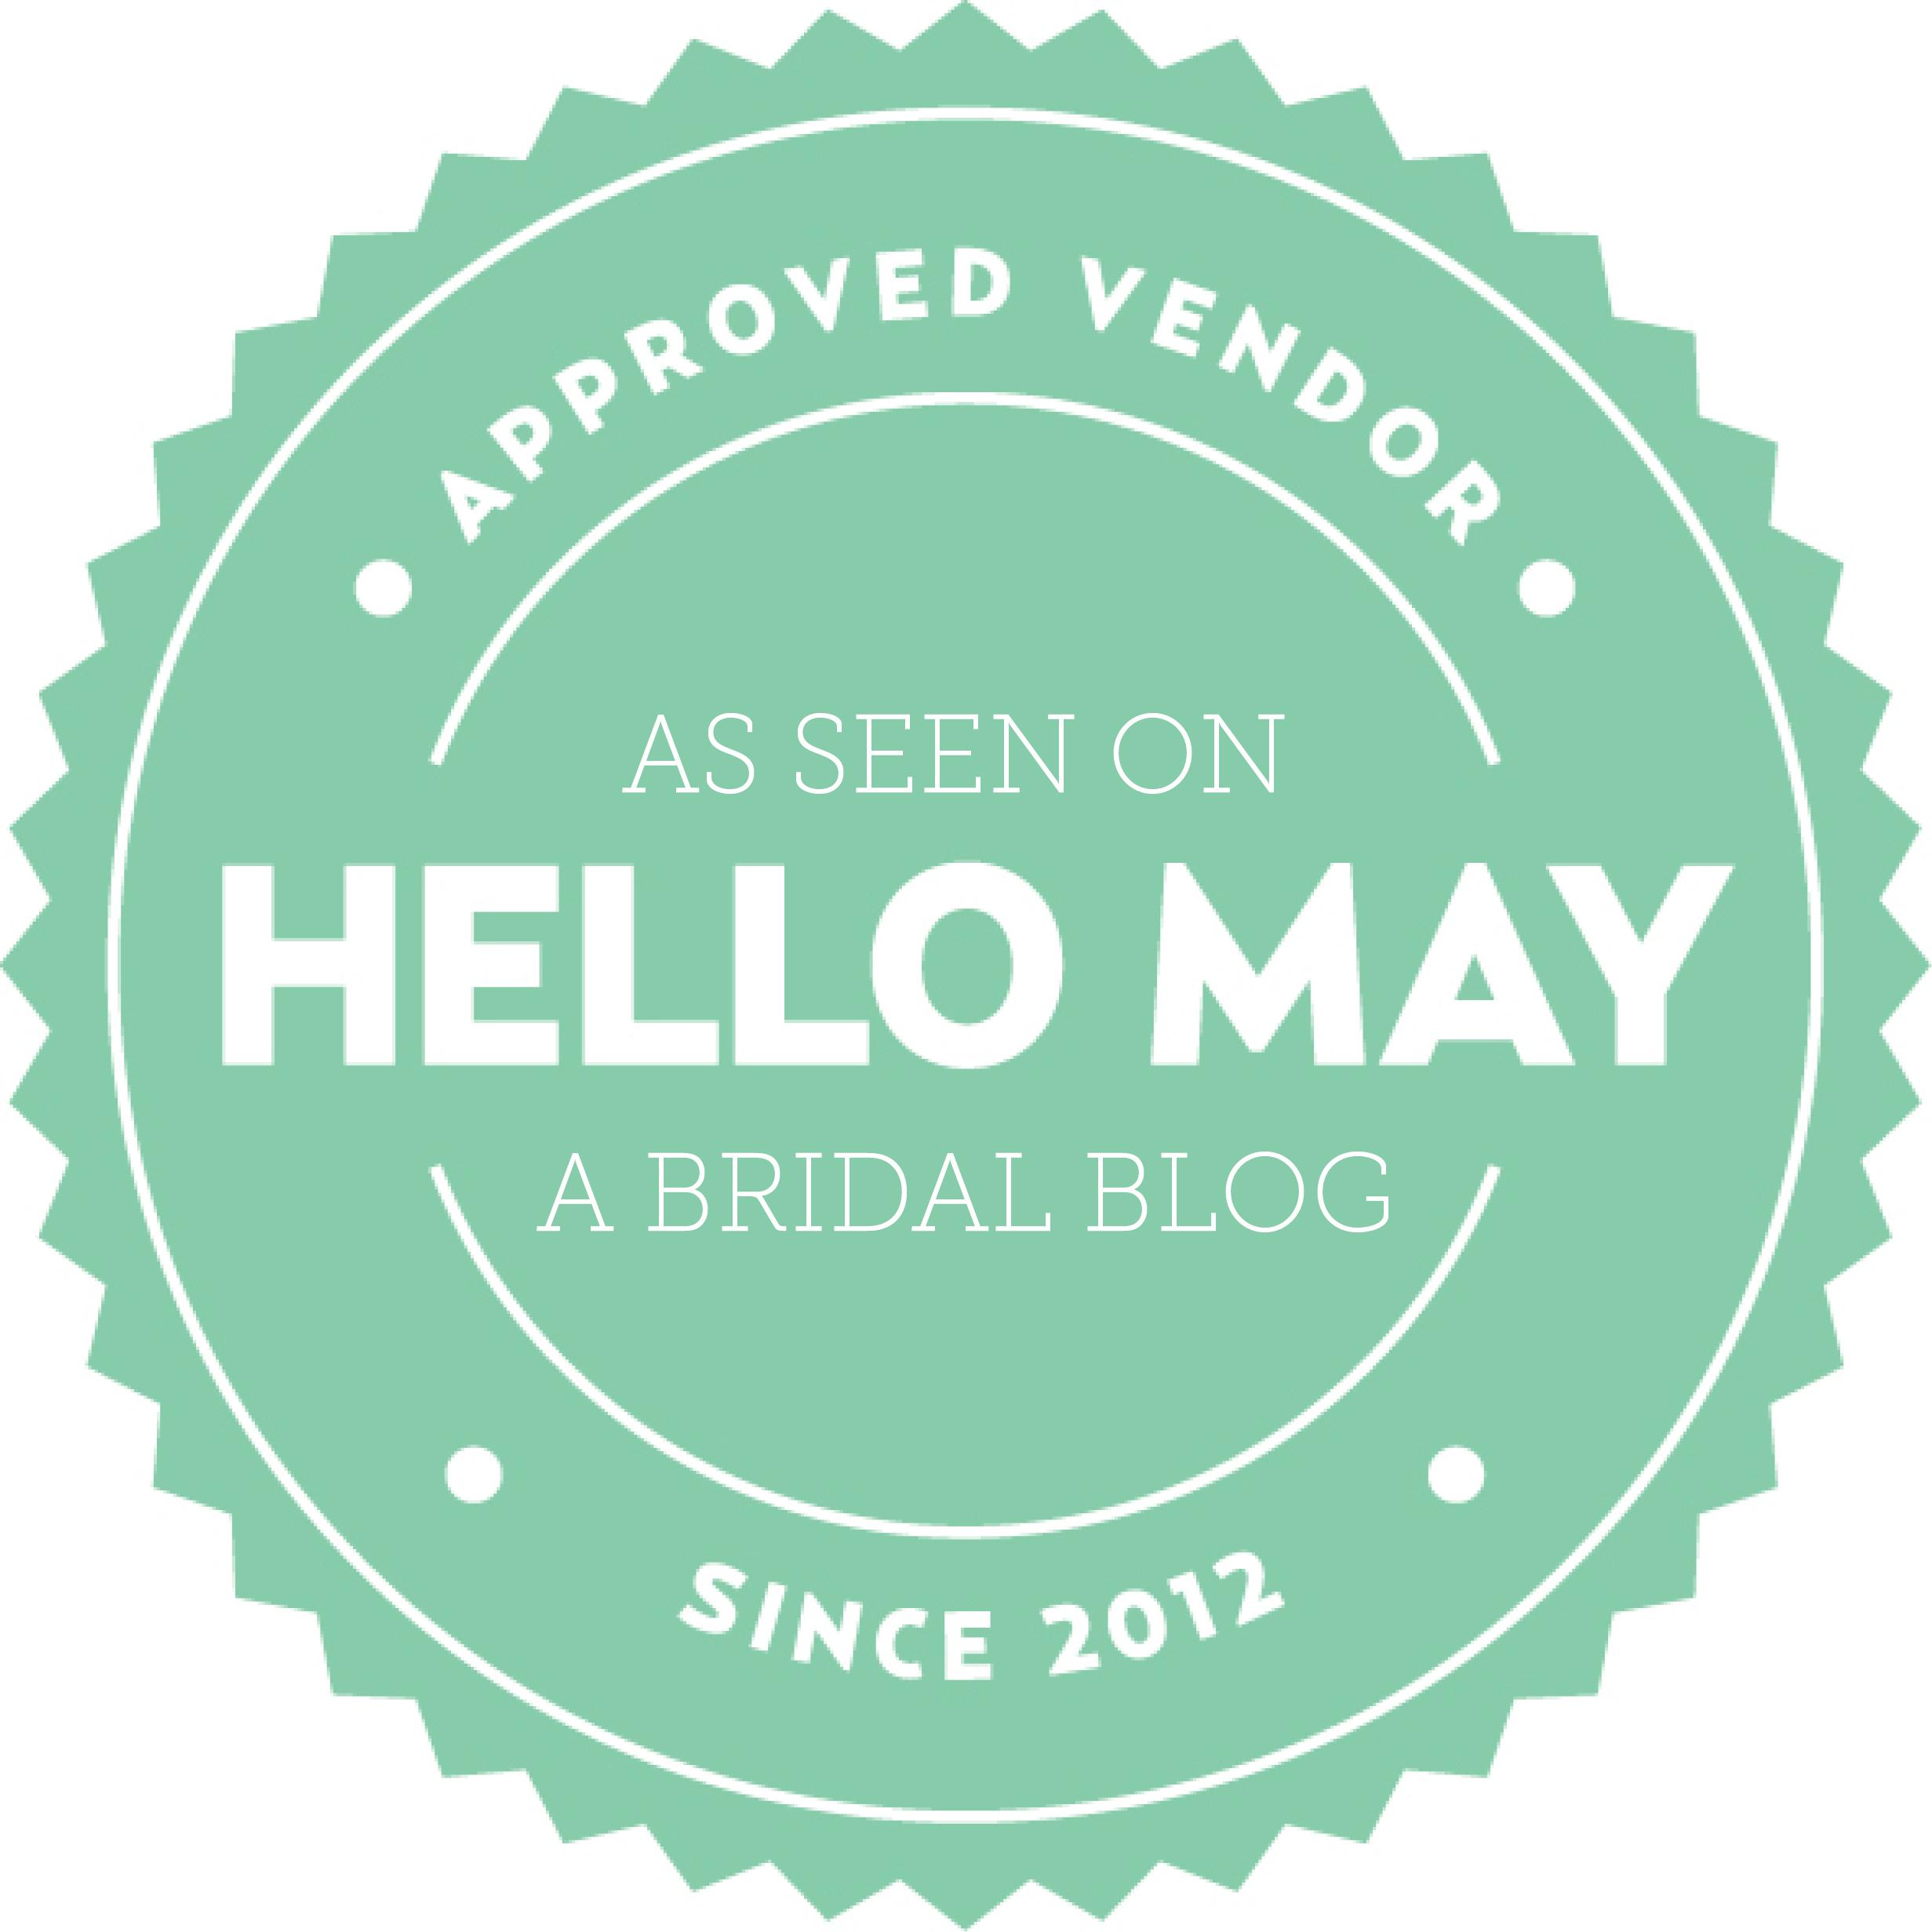 Hello-May_Vendor-badge_blog.jpg